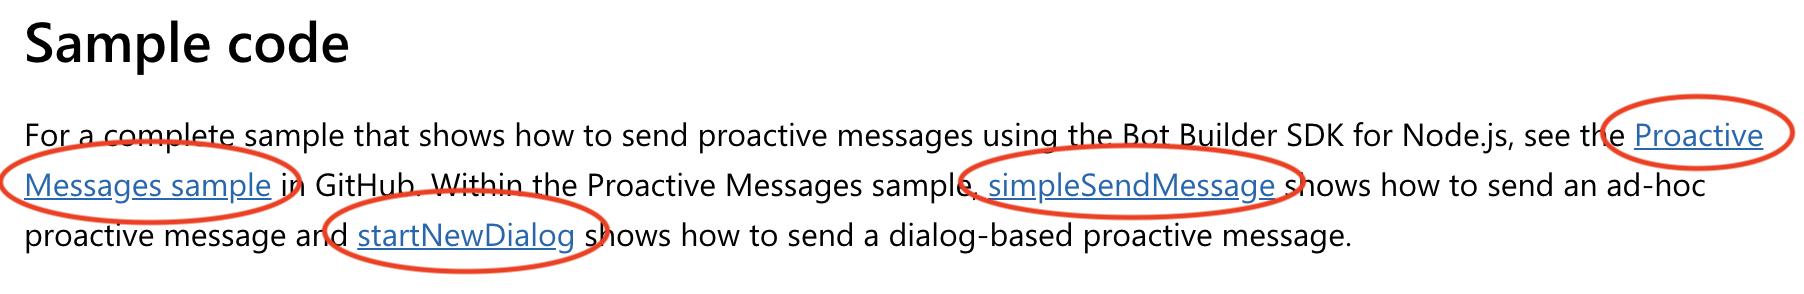 Broken links on nodejs/bot-builder-nodejs-proactive-messages (v3 0